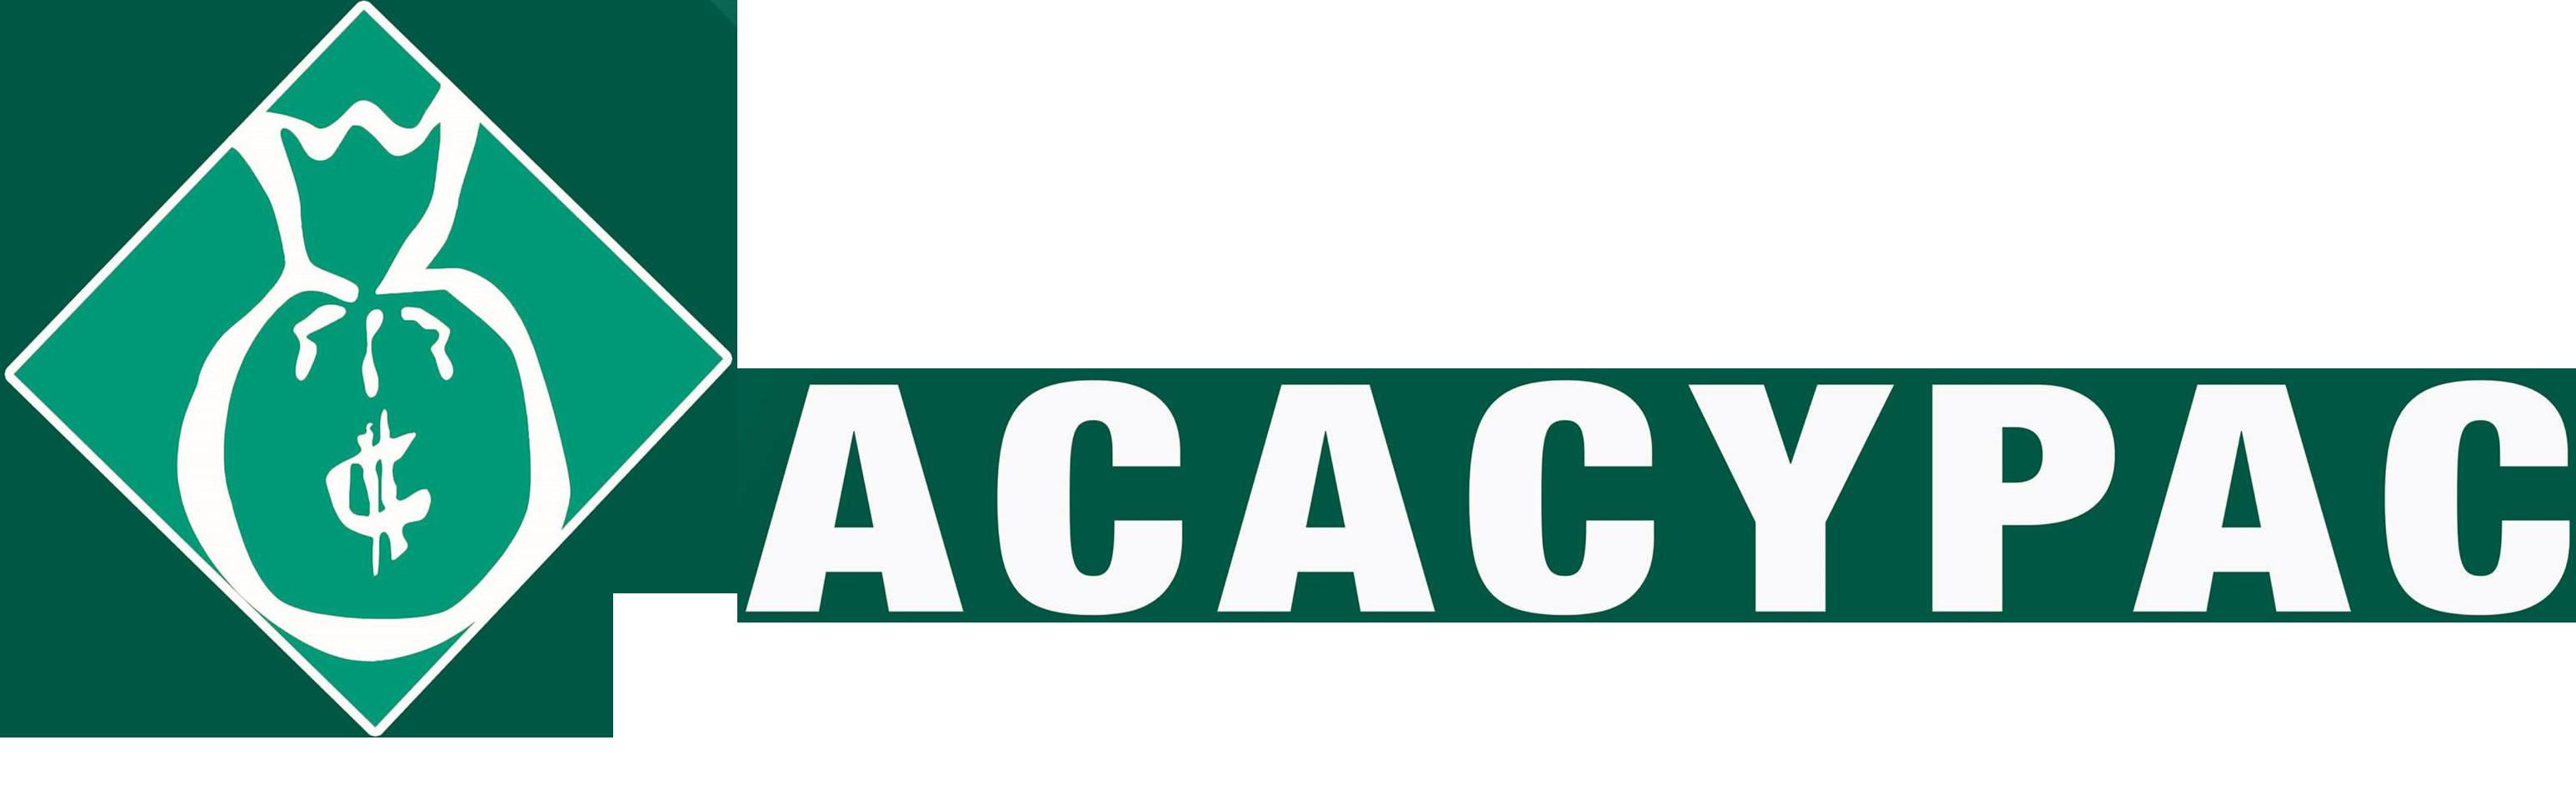 Acacypac